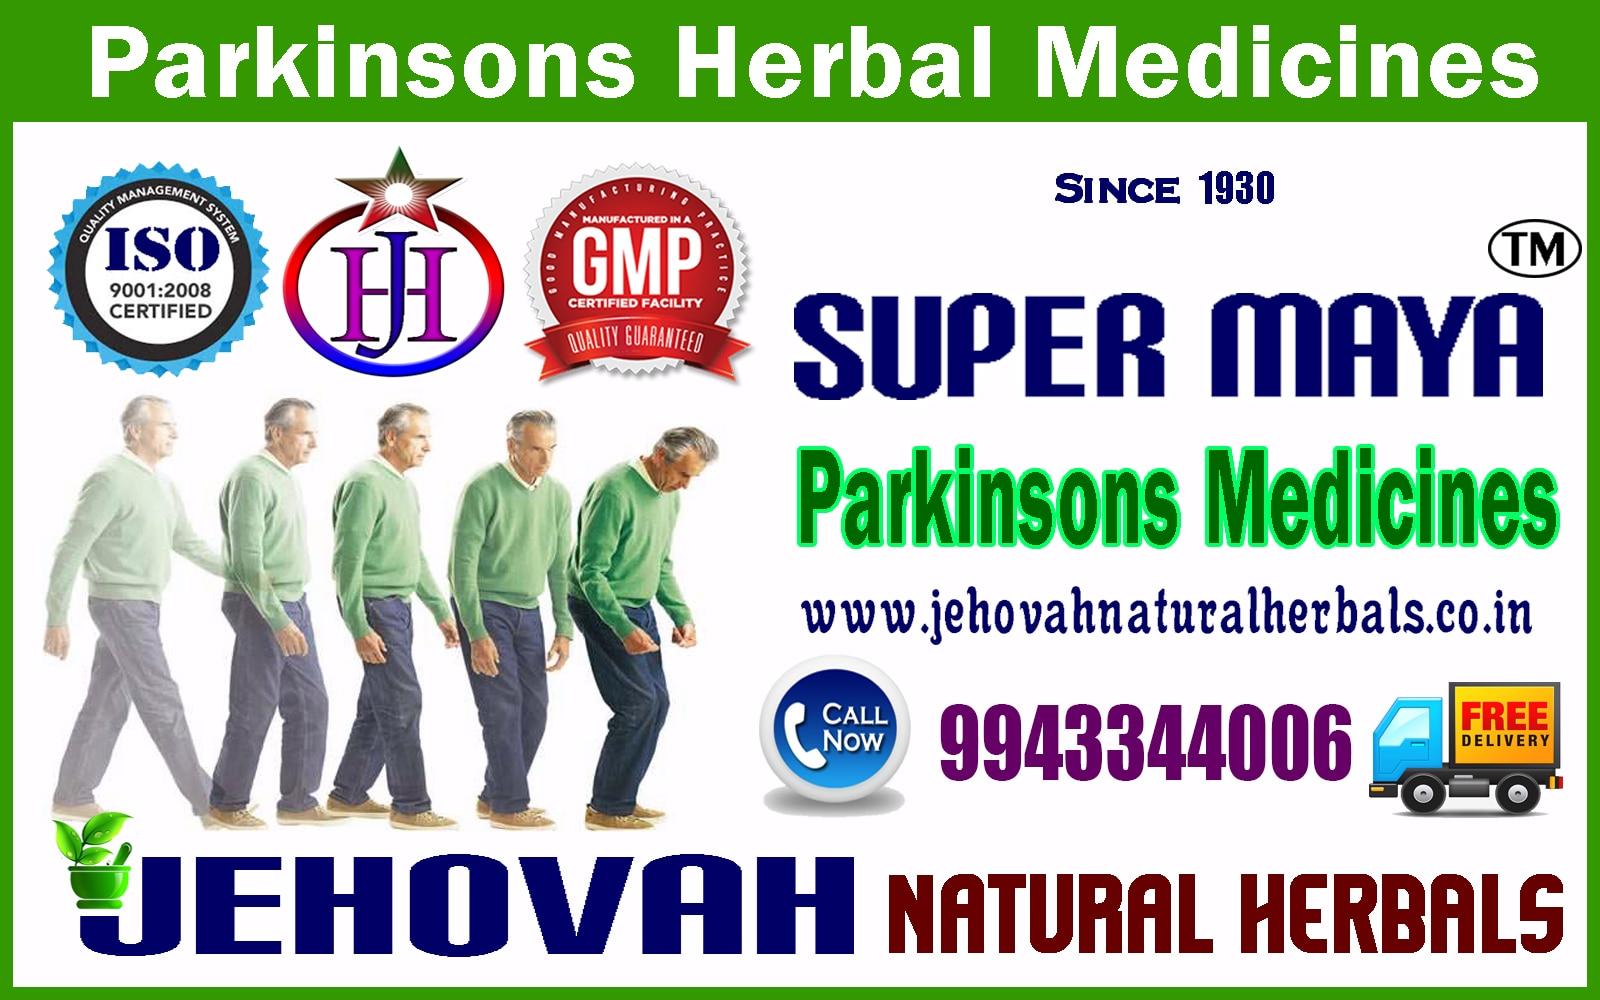 Parkinsons Medicines Super Maya 9943344006